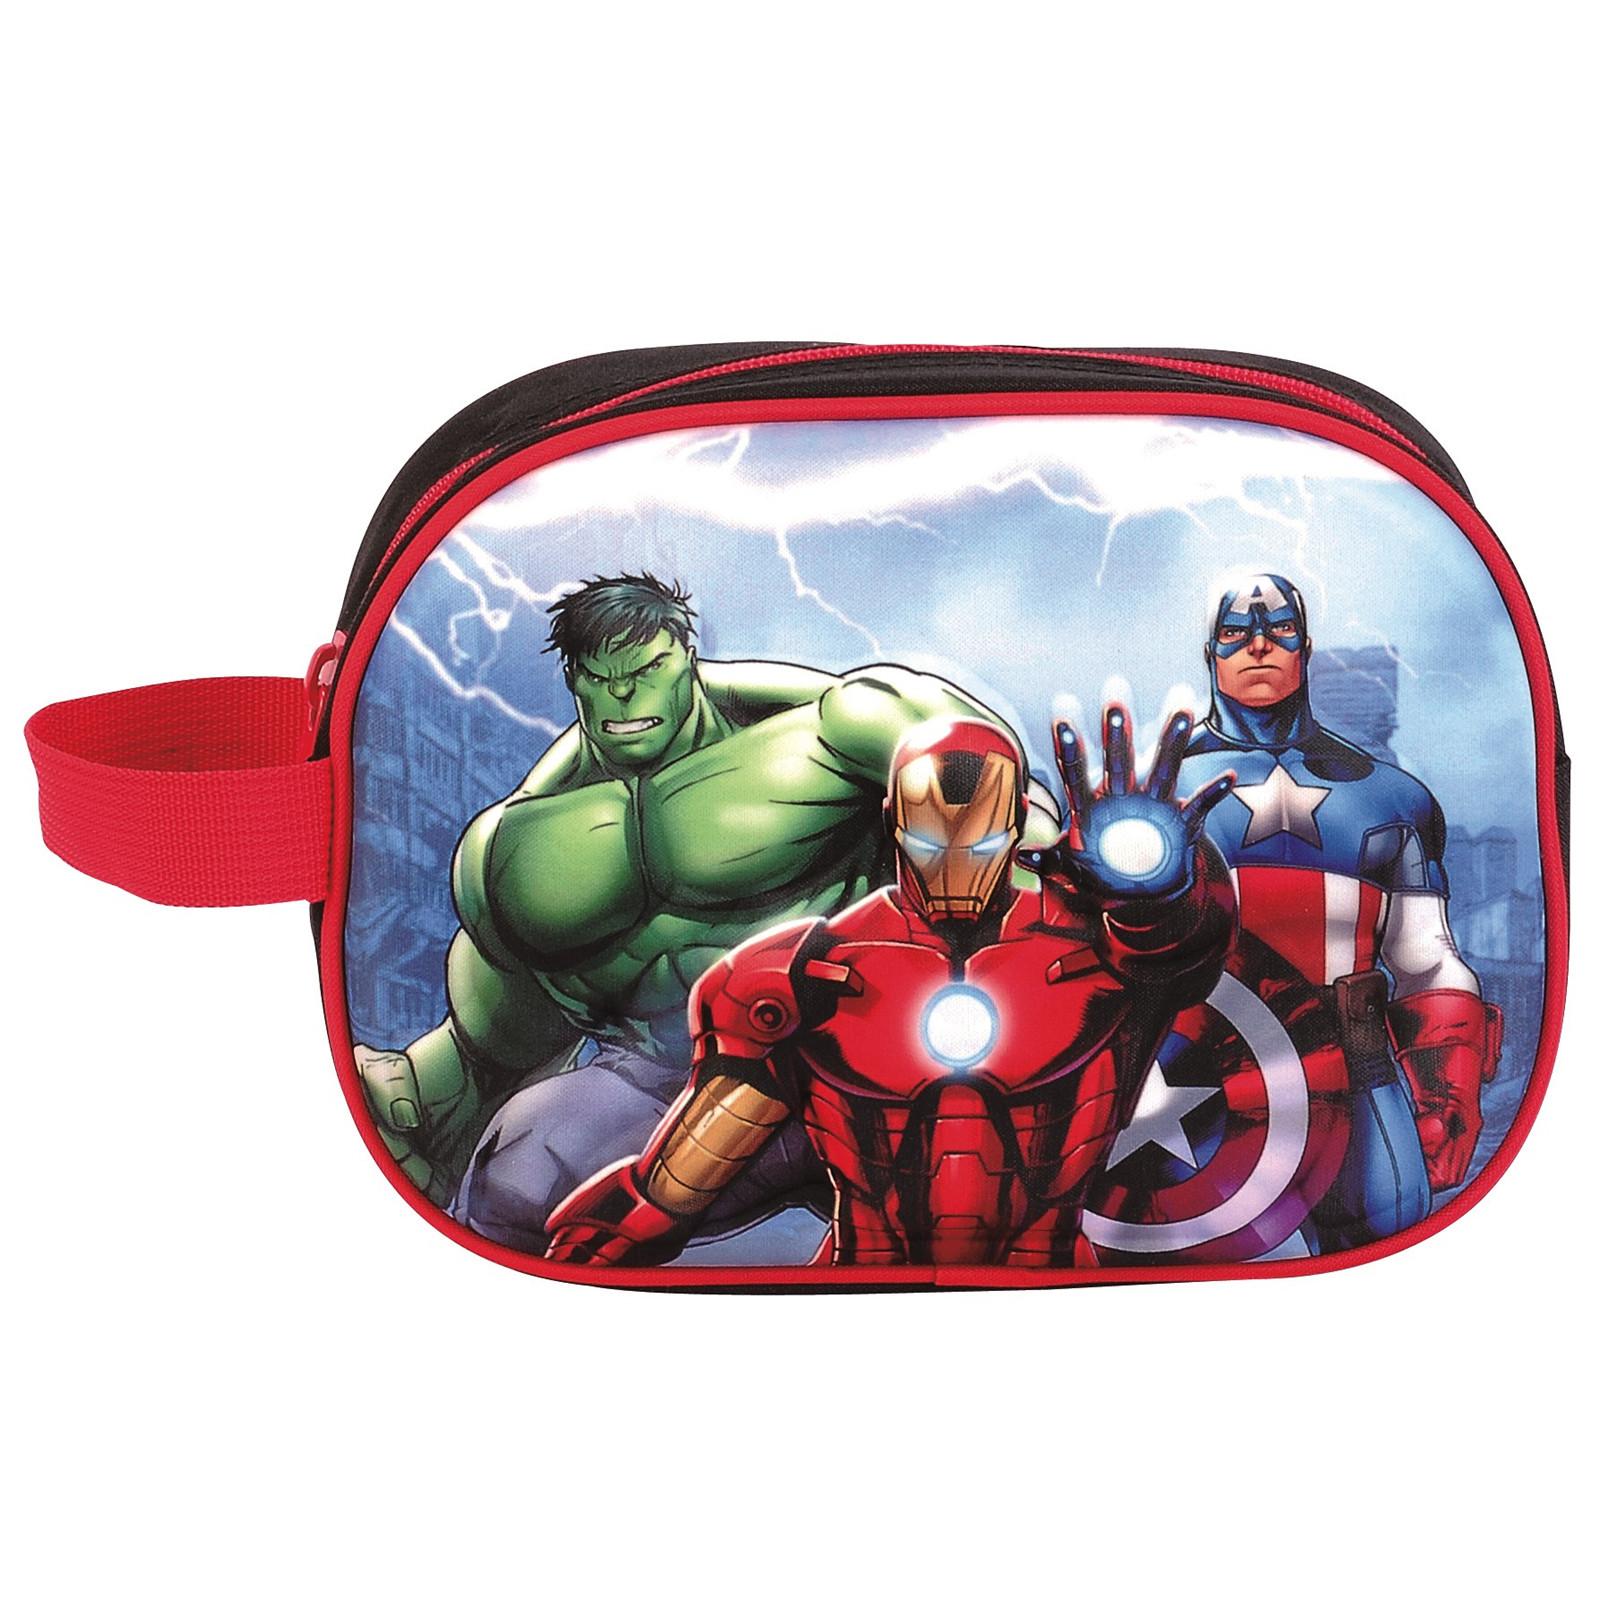 Disney Avengers børnetoilettaske